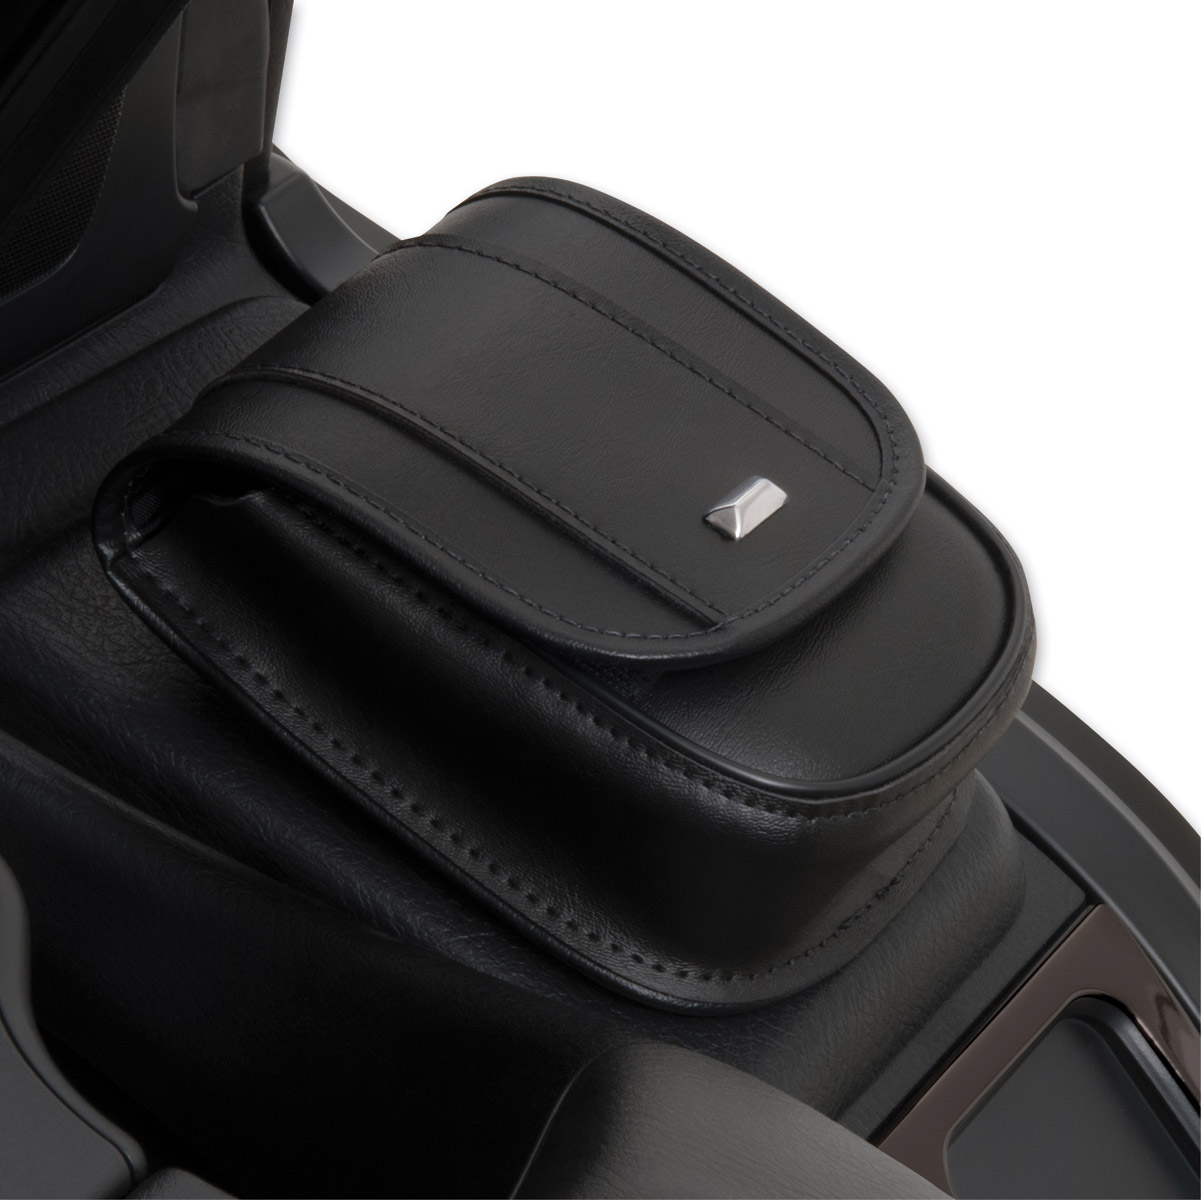 Hopnel Deluxe Fairing Pocket w/Buddy Lock System